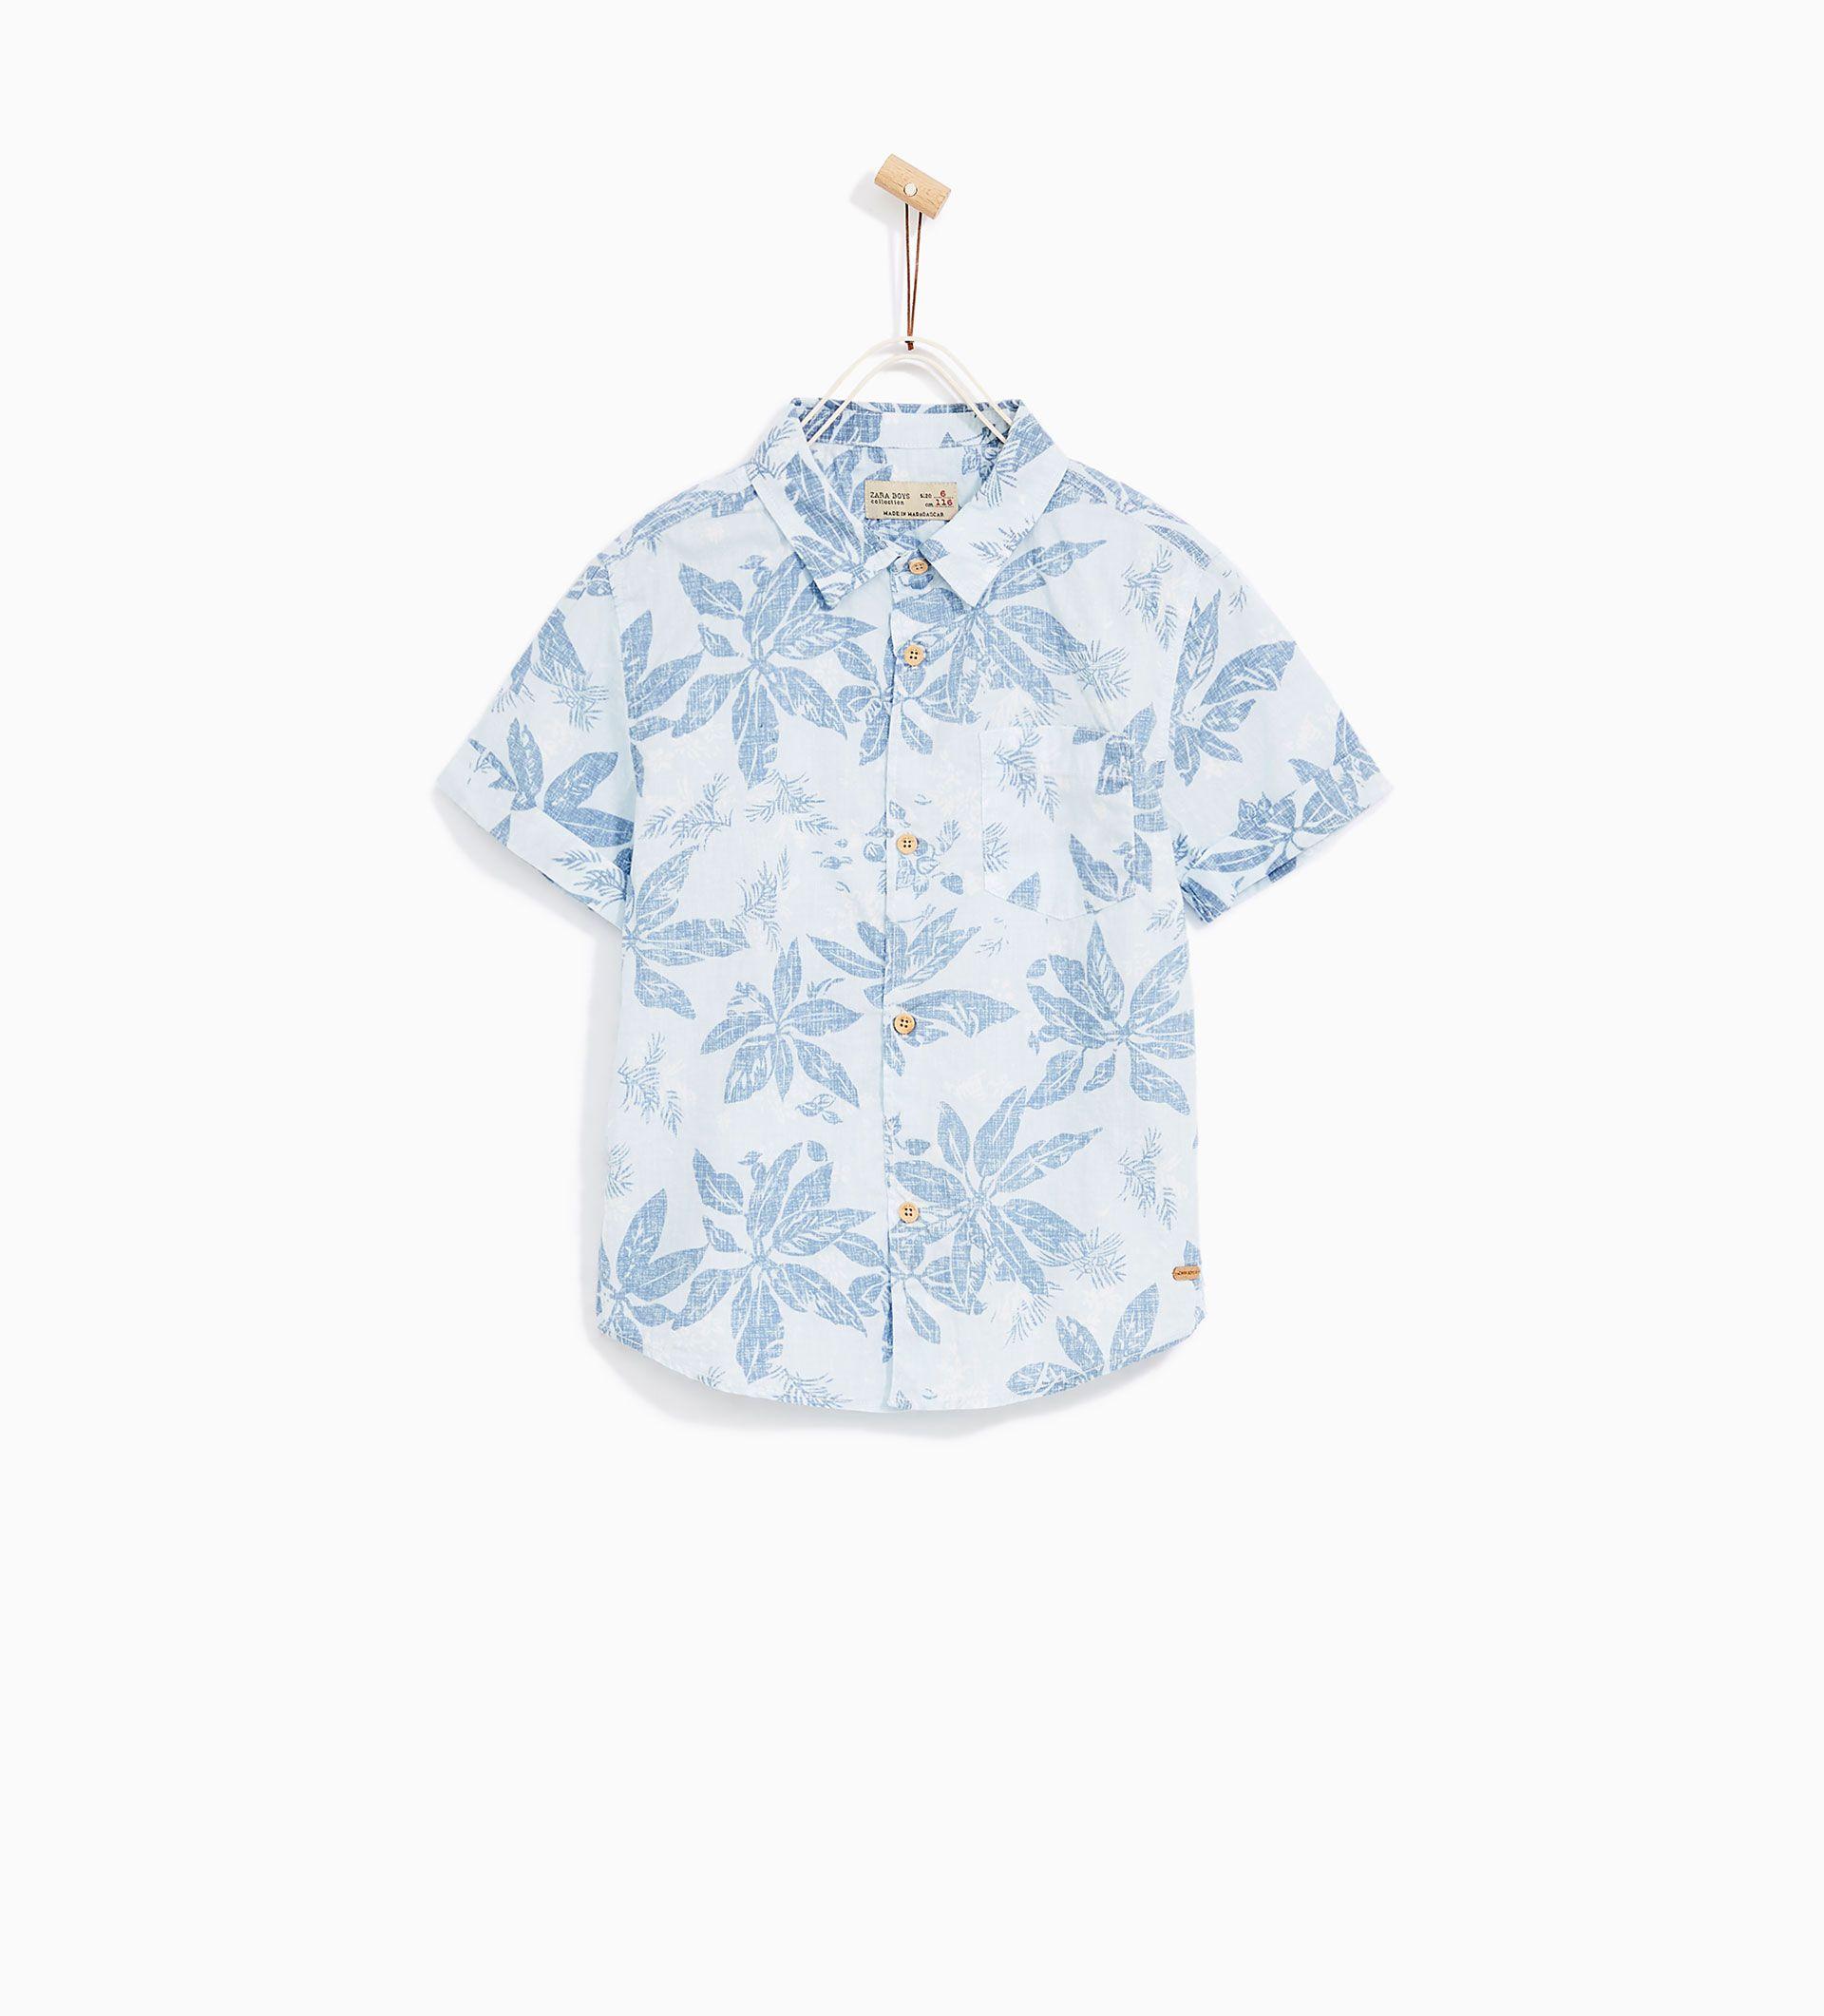 3c591e3de ZARA - KIDS - FLORAL HAWAIIAN SHIRT | Kaydens wardrobe | Boys ...